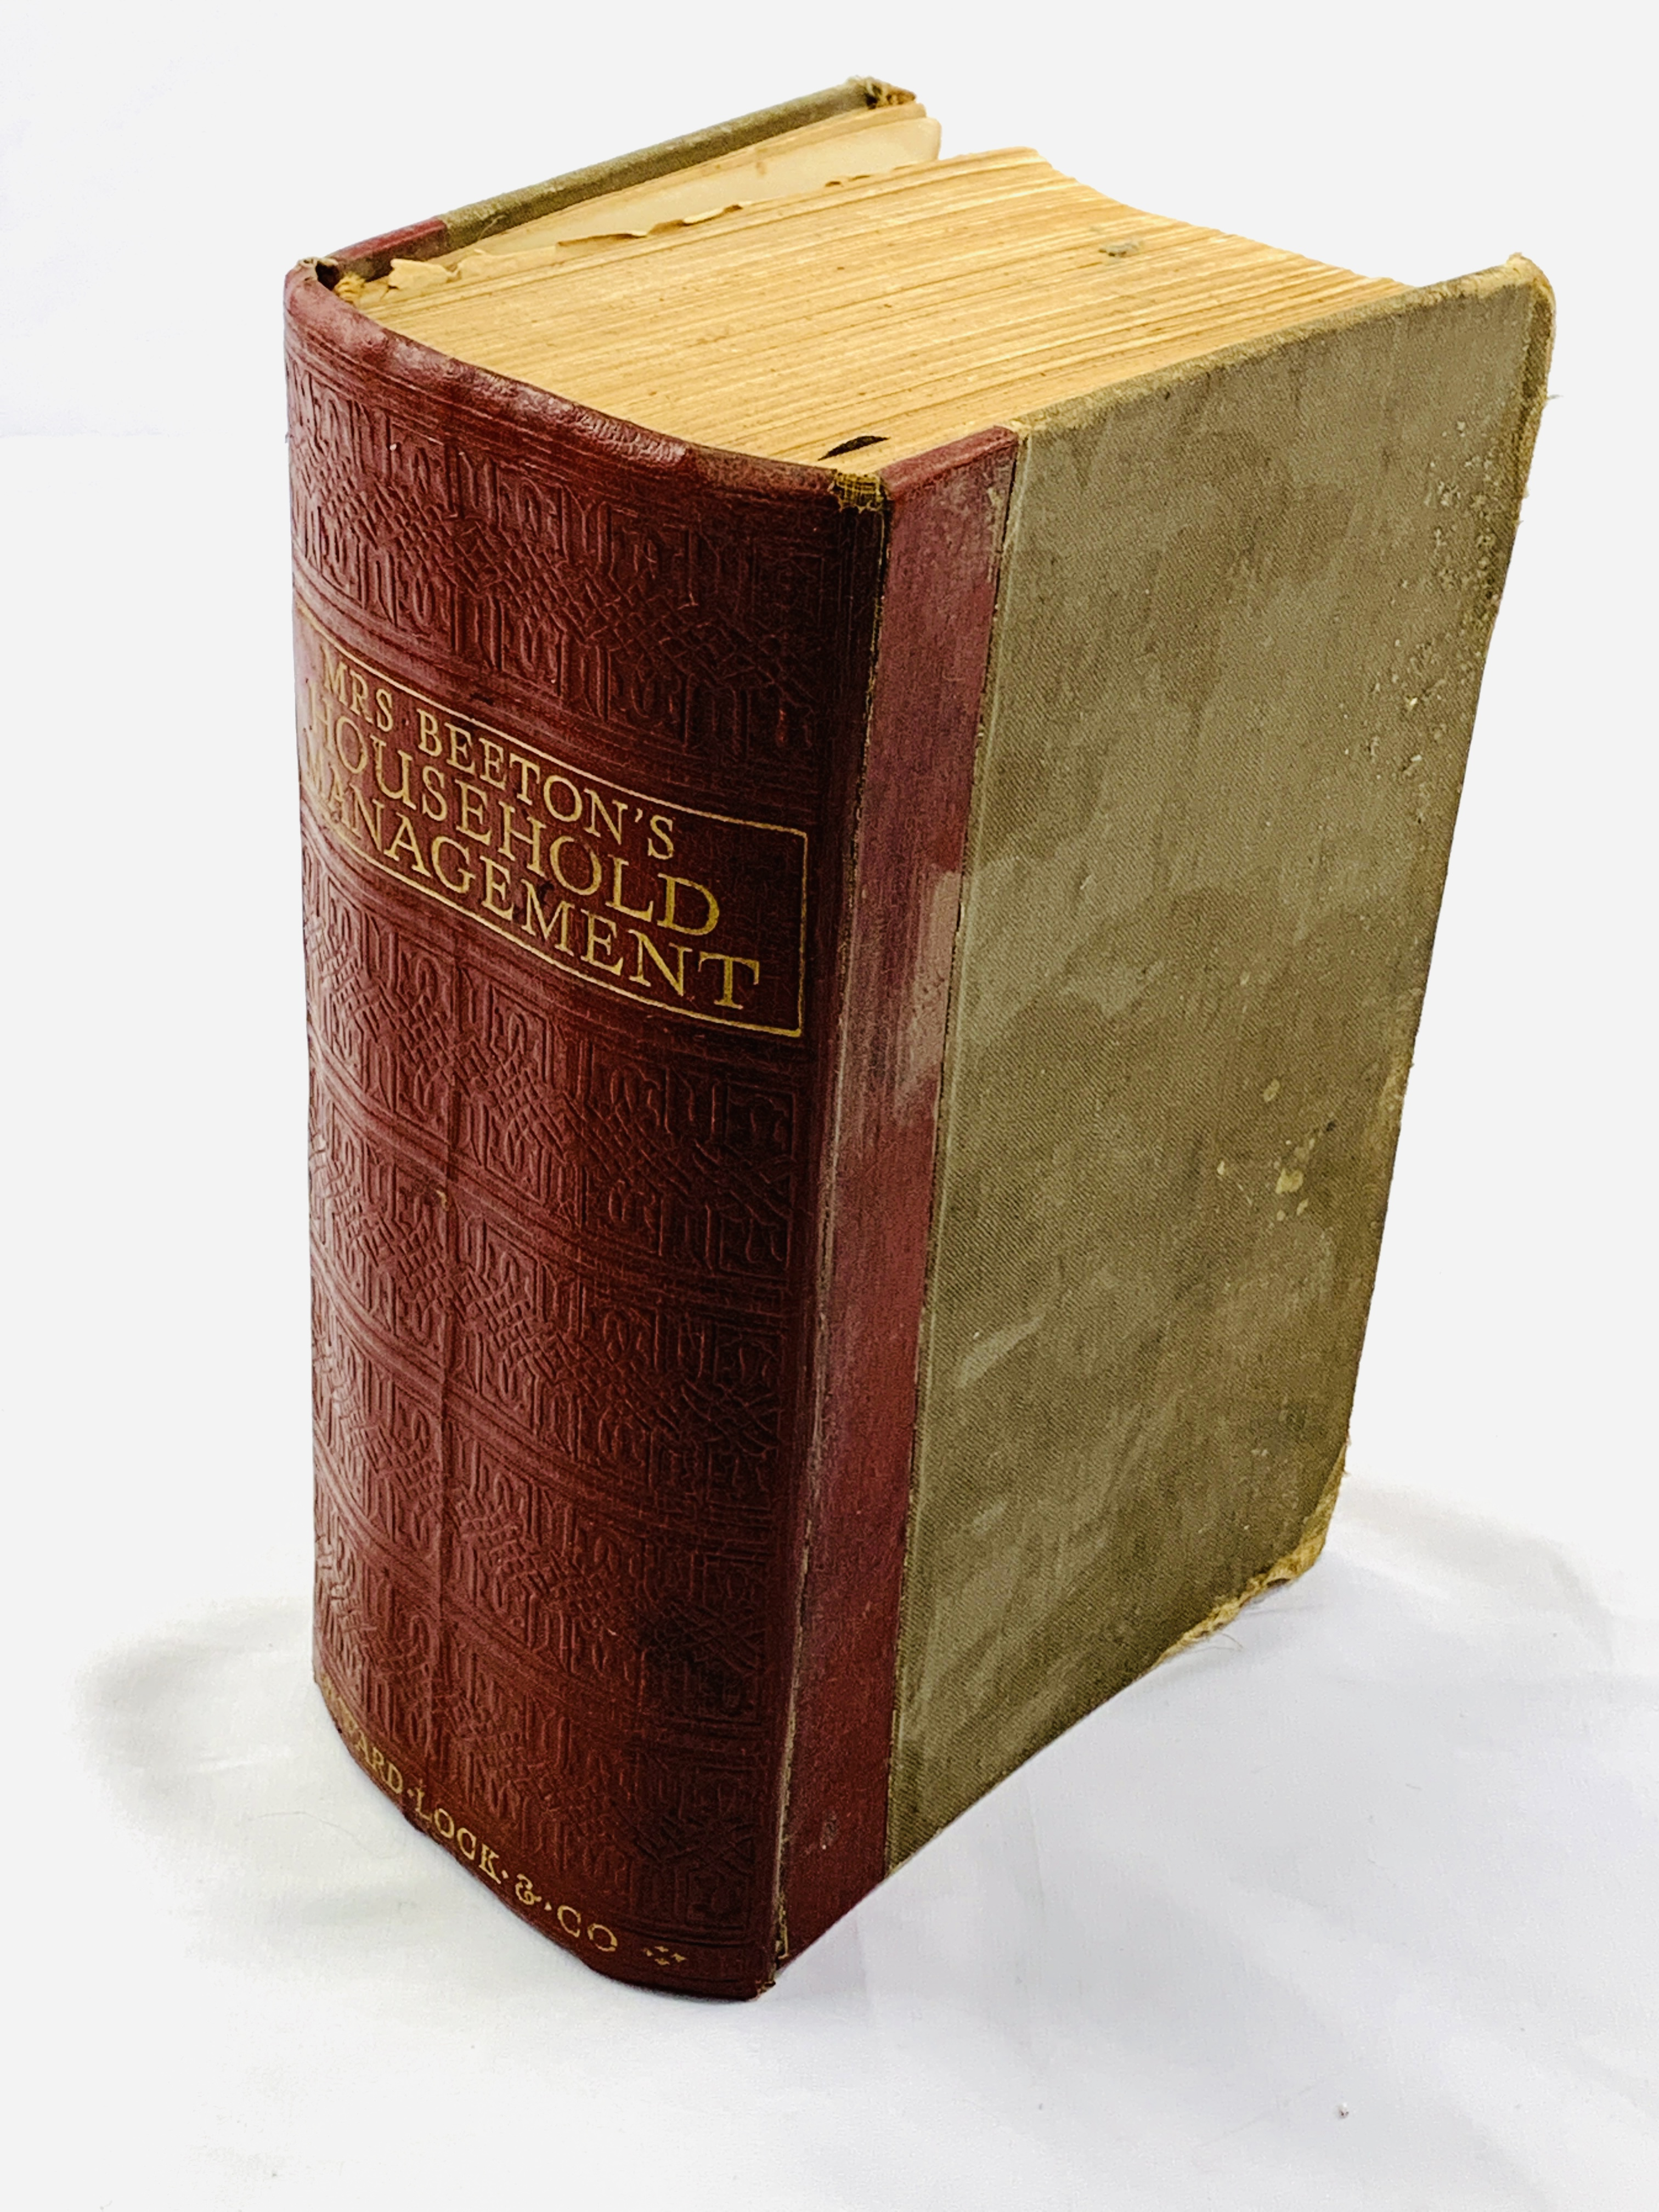 Mrs Beeton's Household Management, published 1923